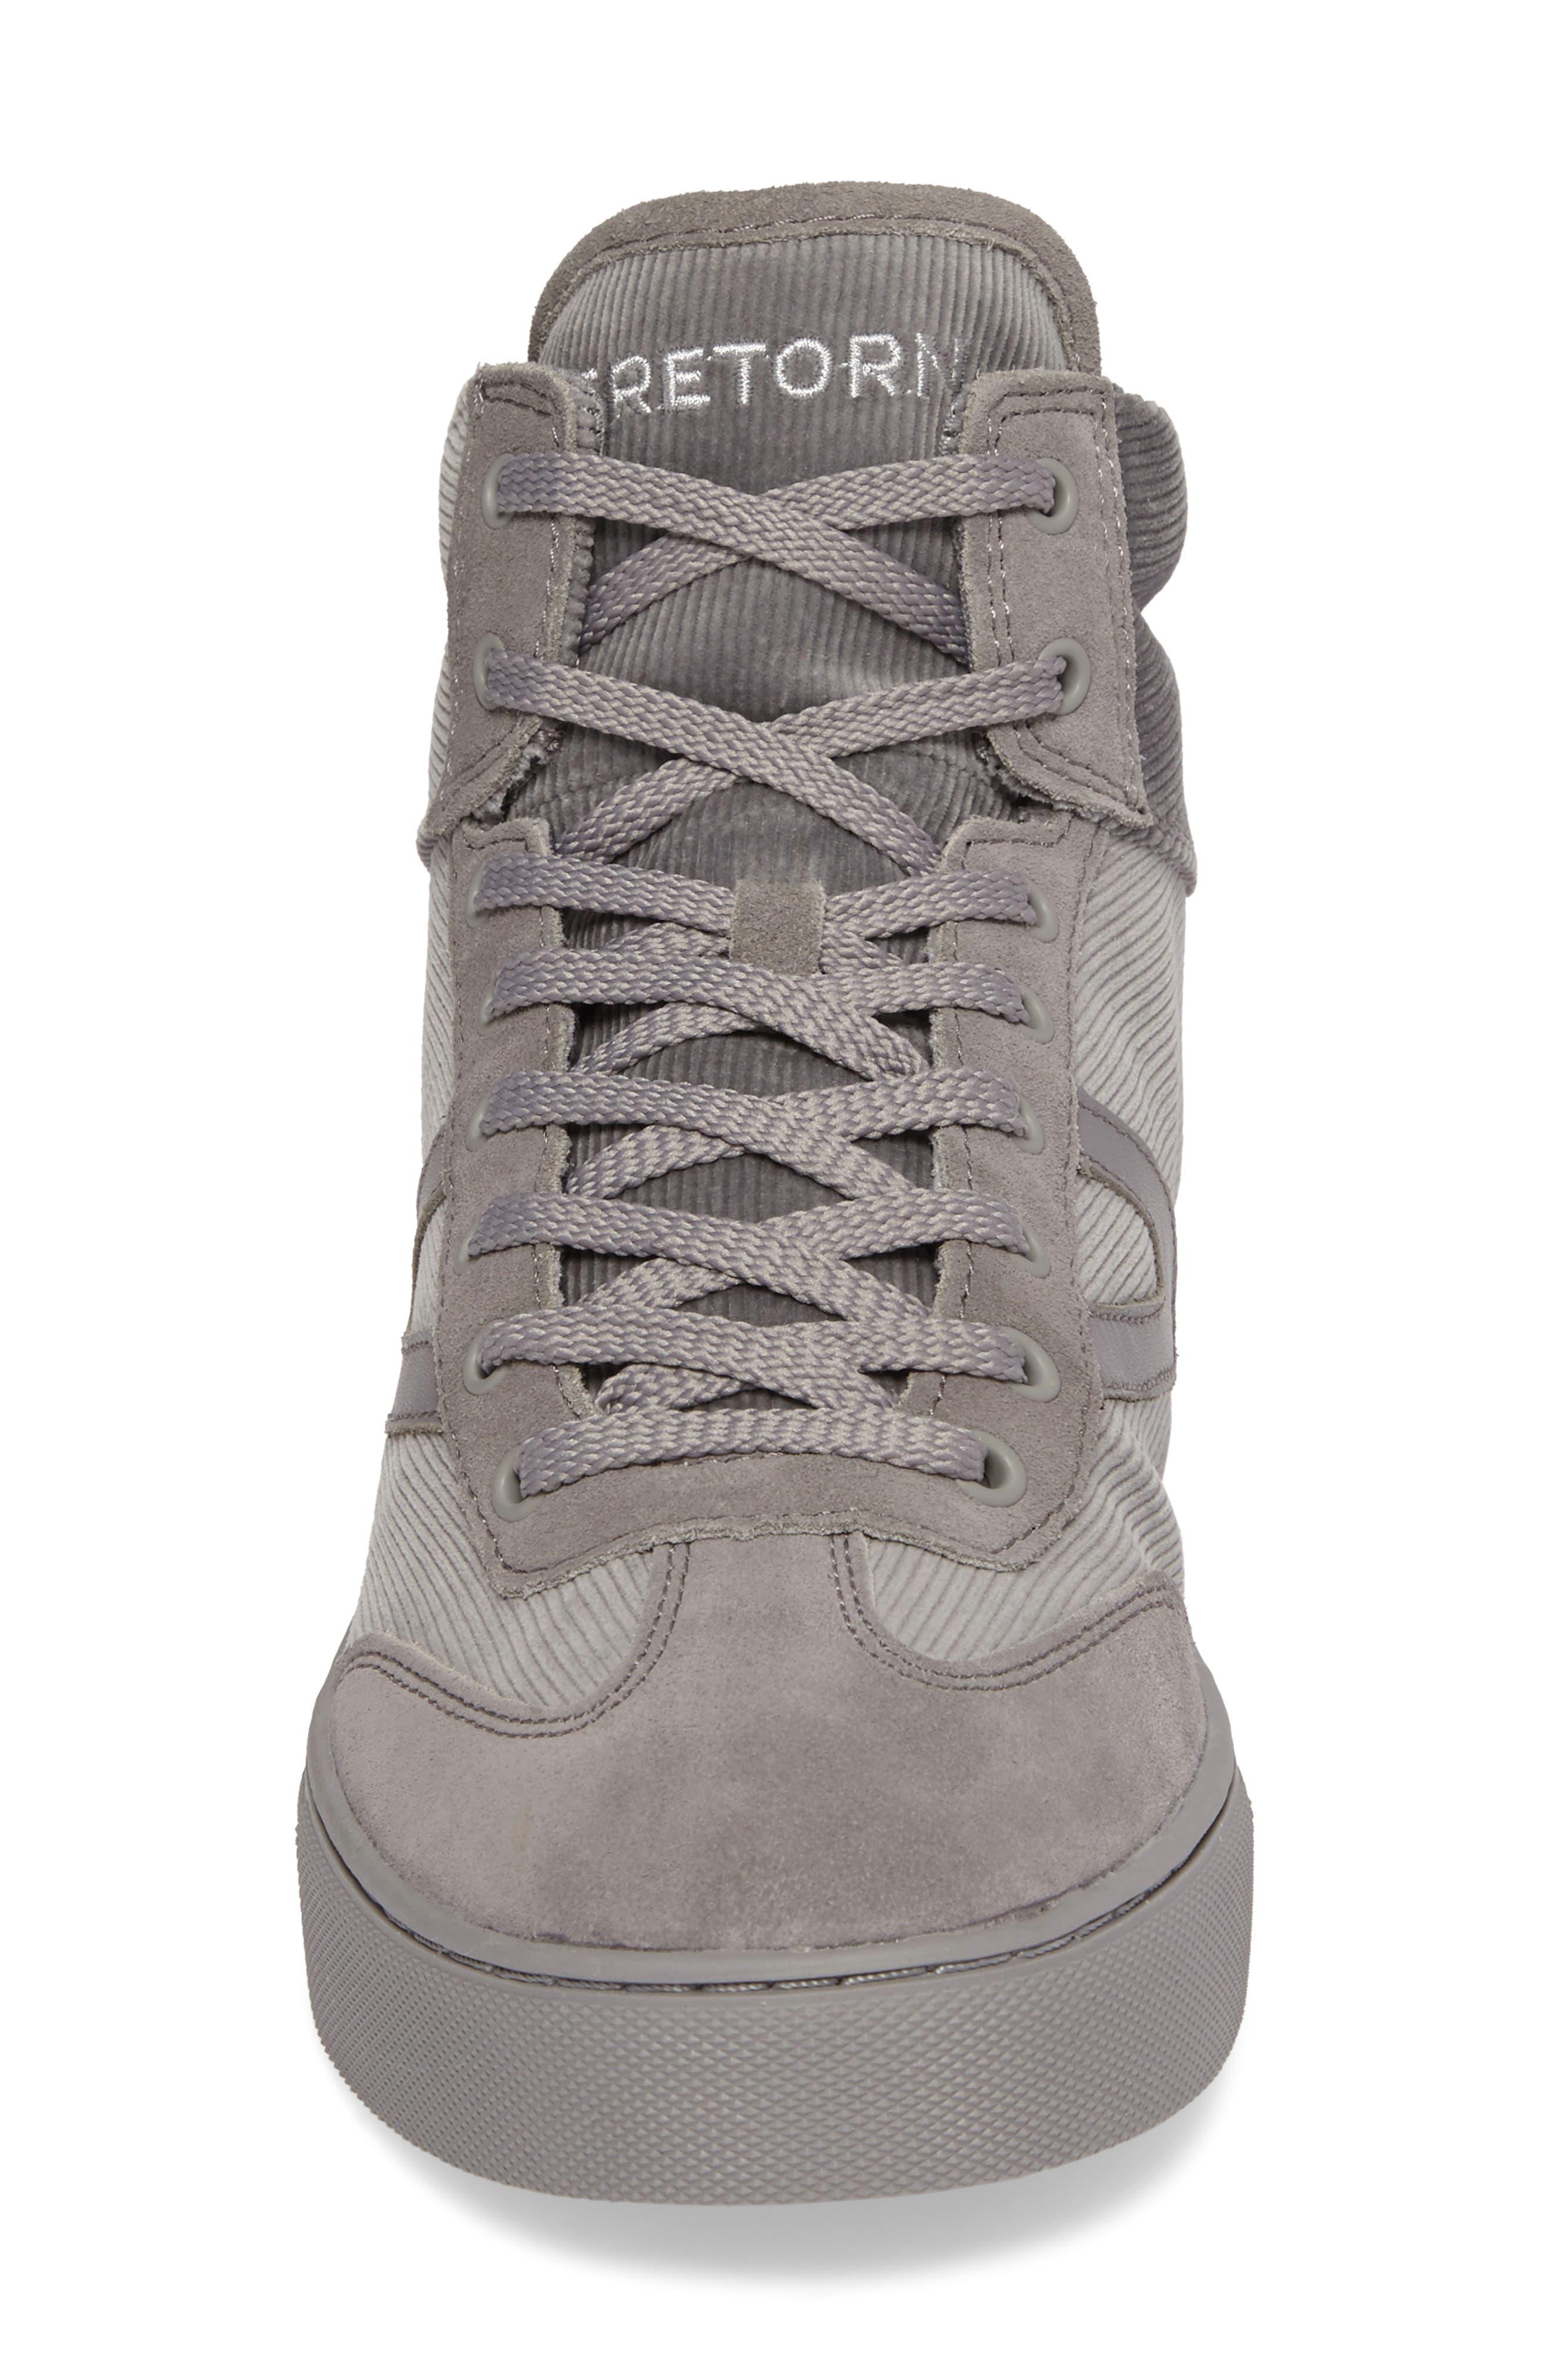 Jack High Top Sneaker,                             Alternate thumbnail 4, color,                             Grey/ Grey